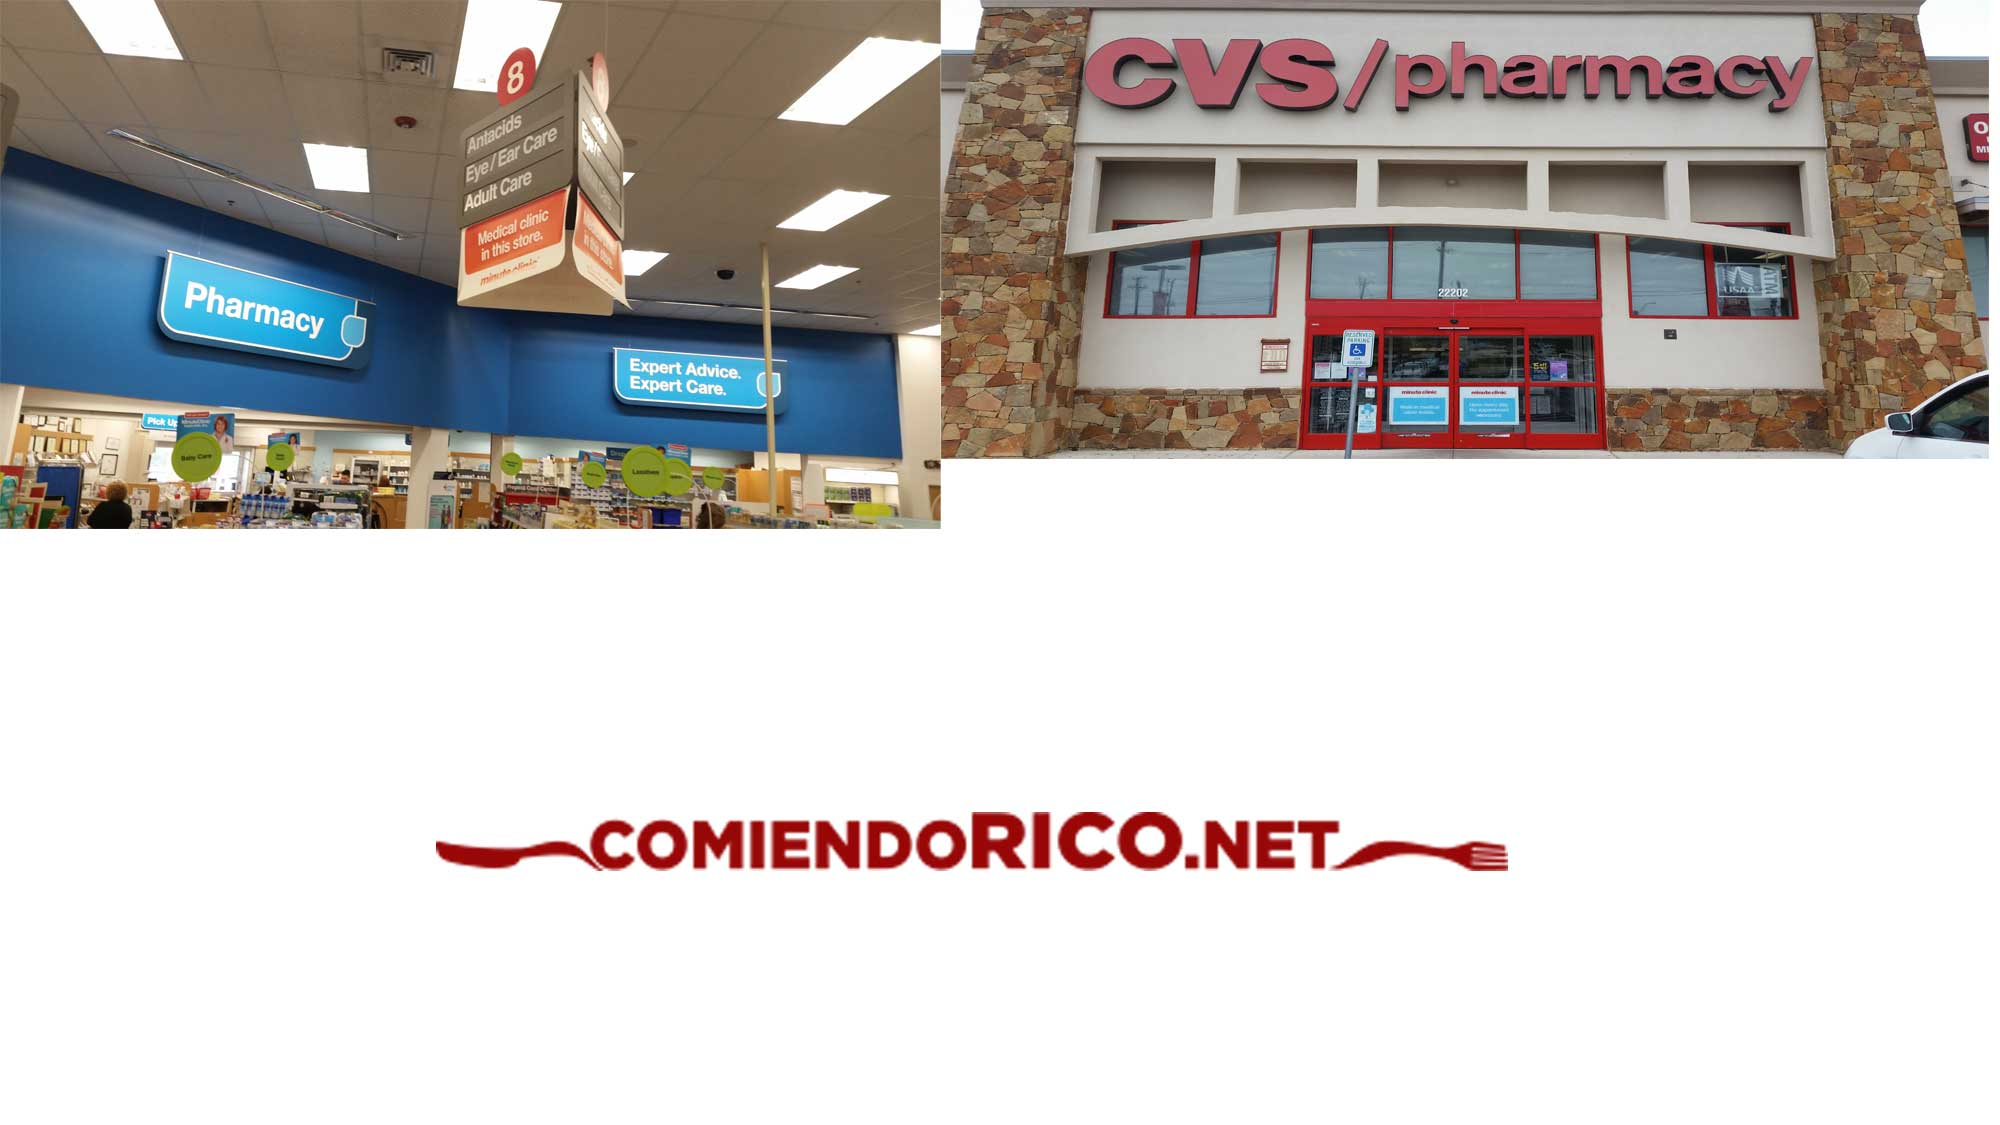 incontinencia urinaria, tena men, cvs pharmacy